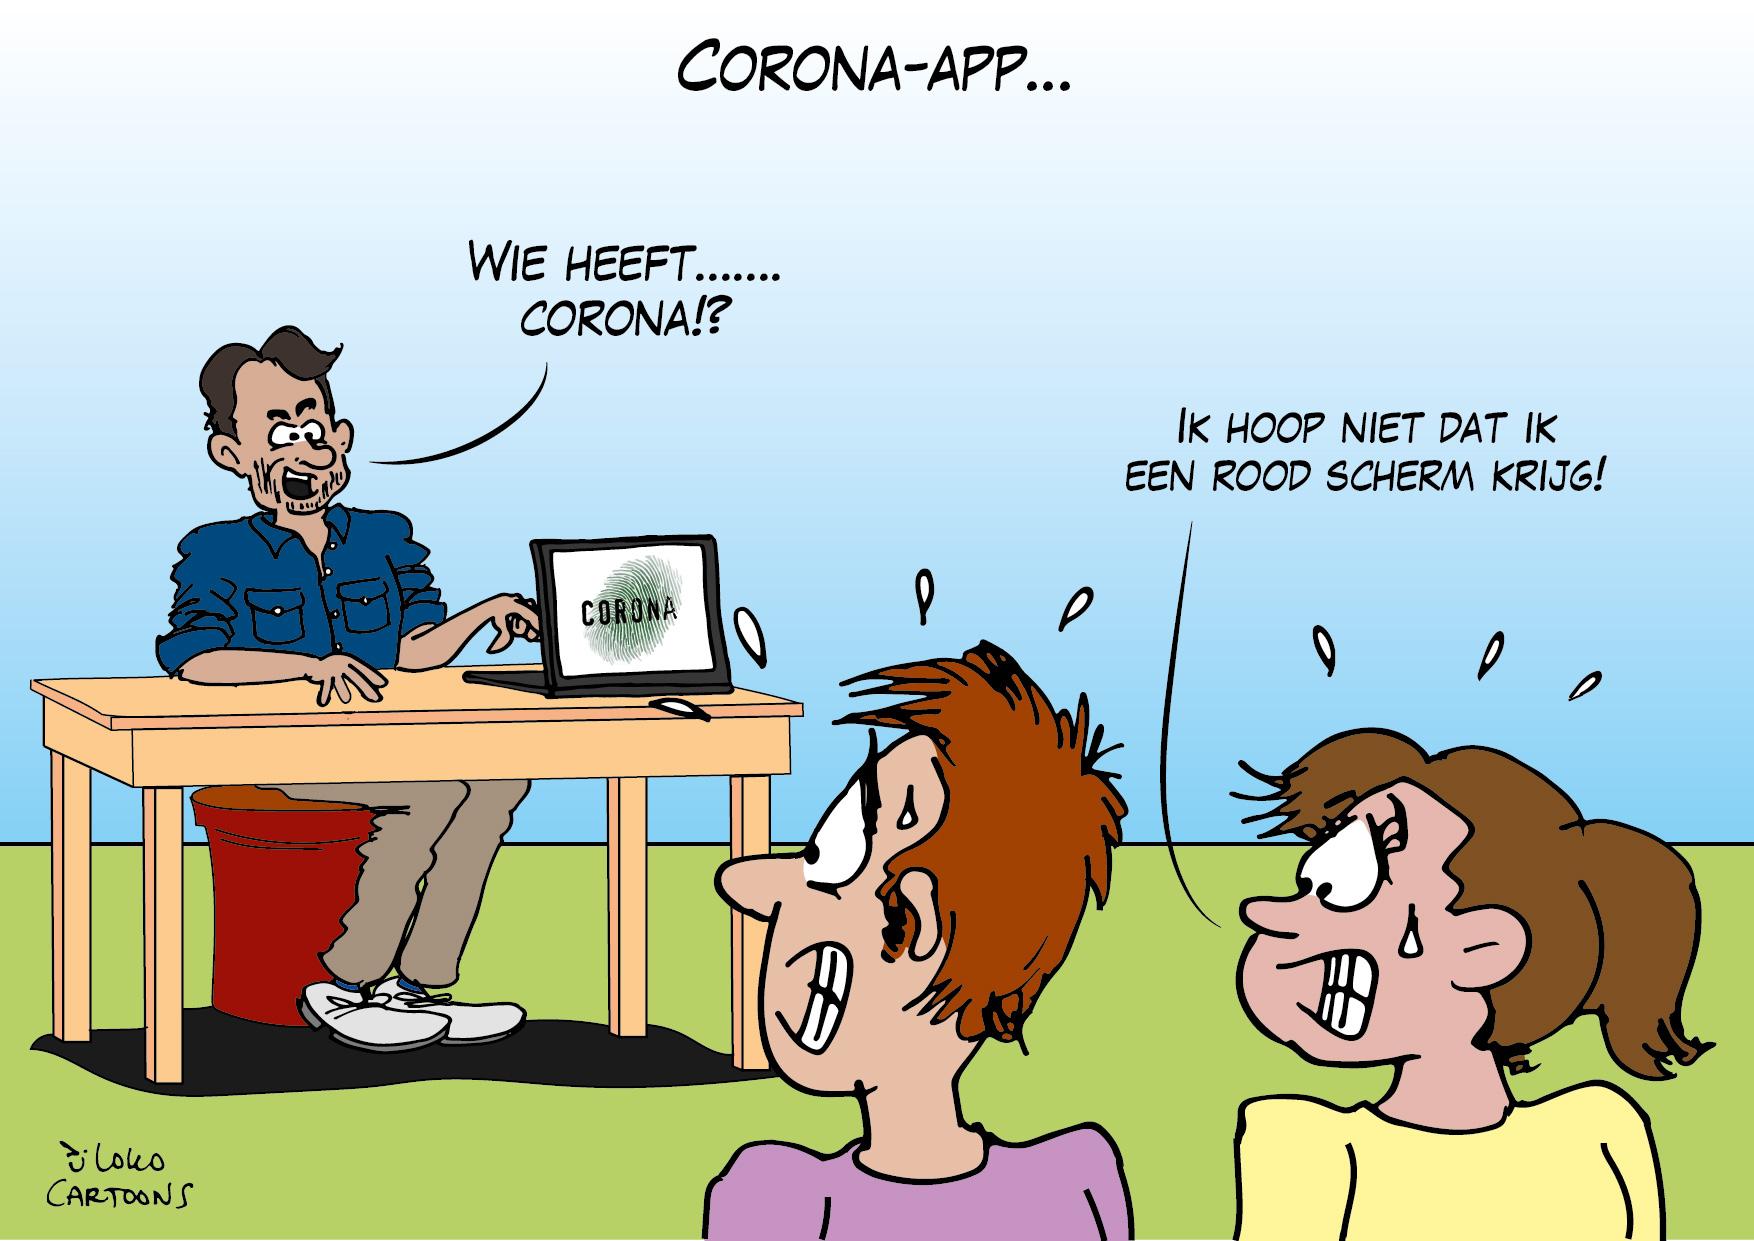 Corona-app…